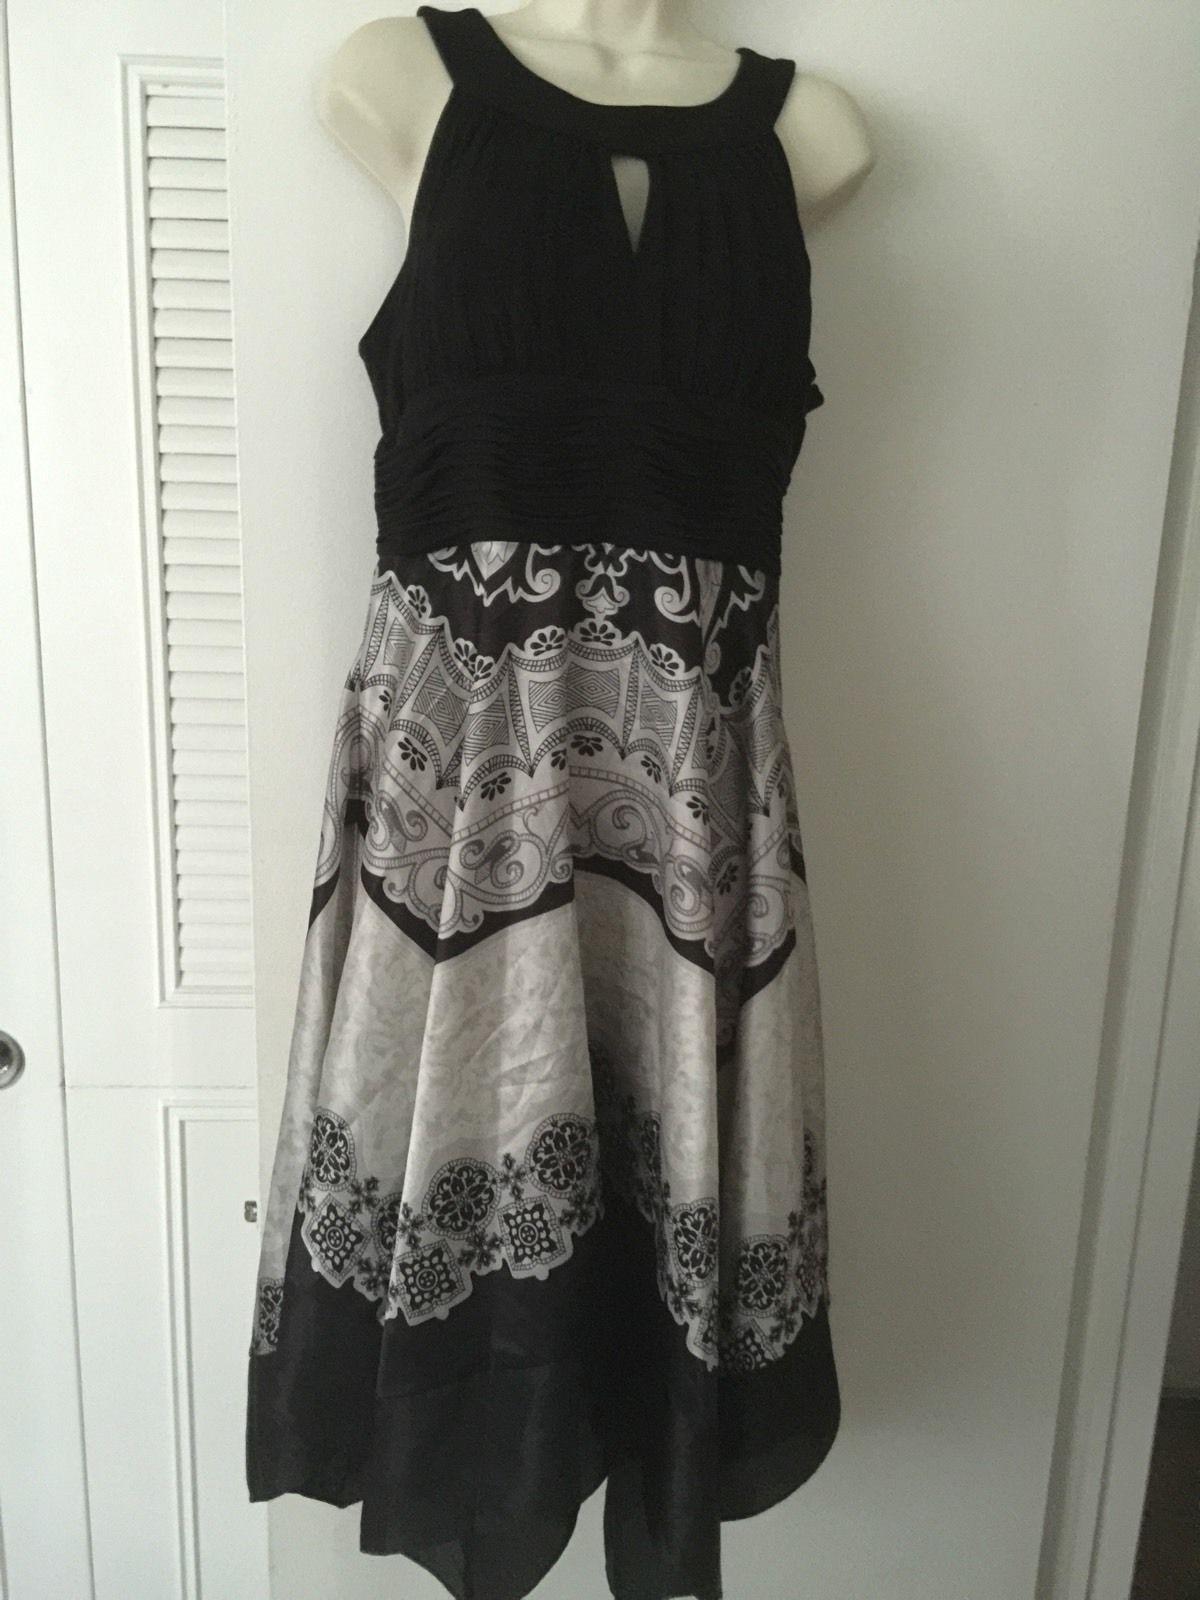 06bd25ecfc8311 Womens Signature Dress By Sangria Black   White Cocktail Sz 12 ...